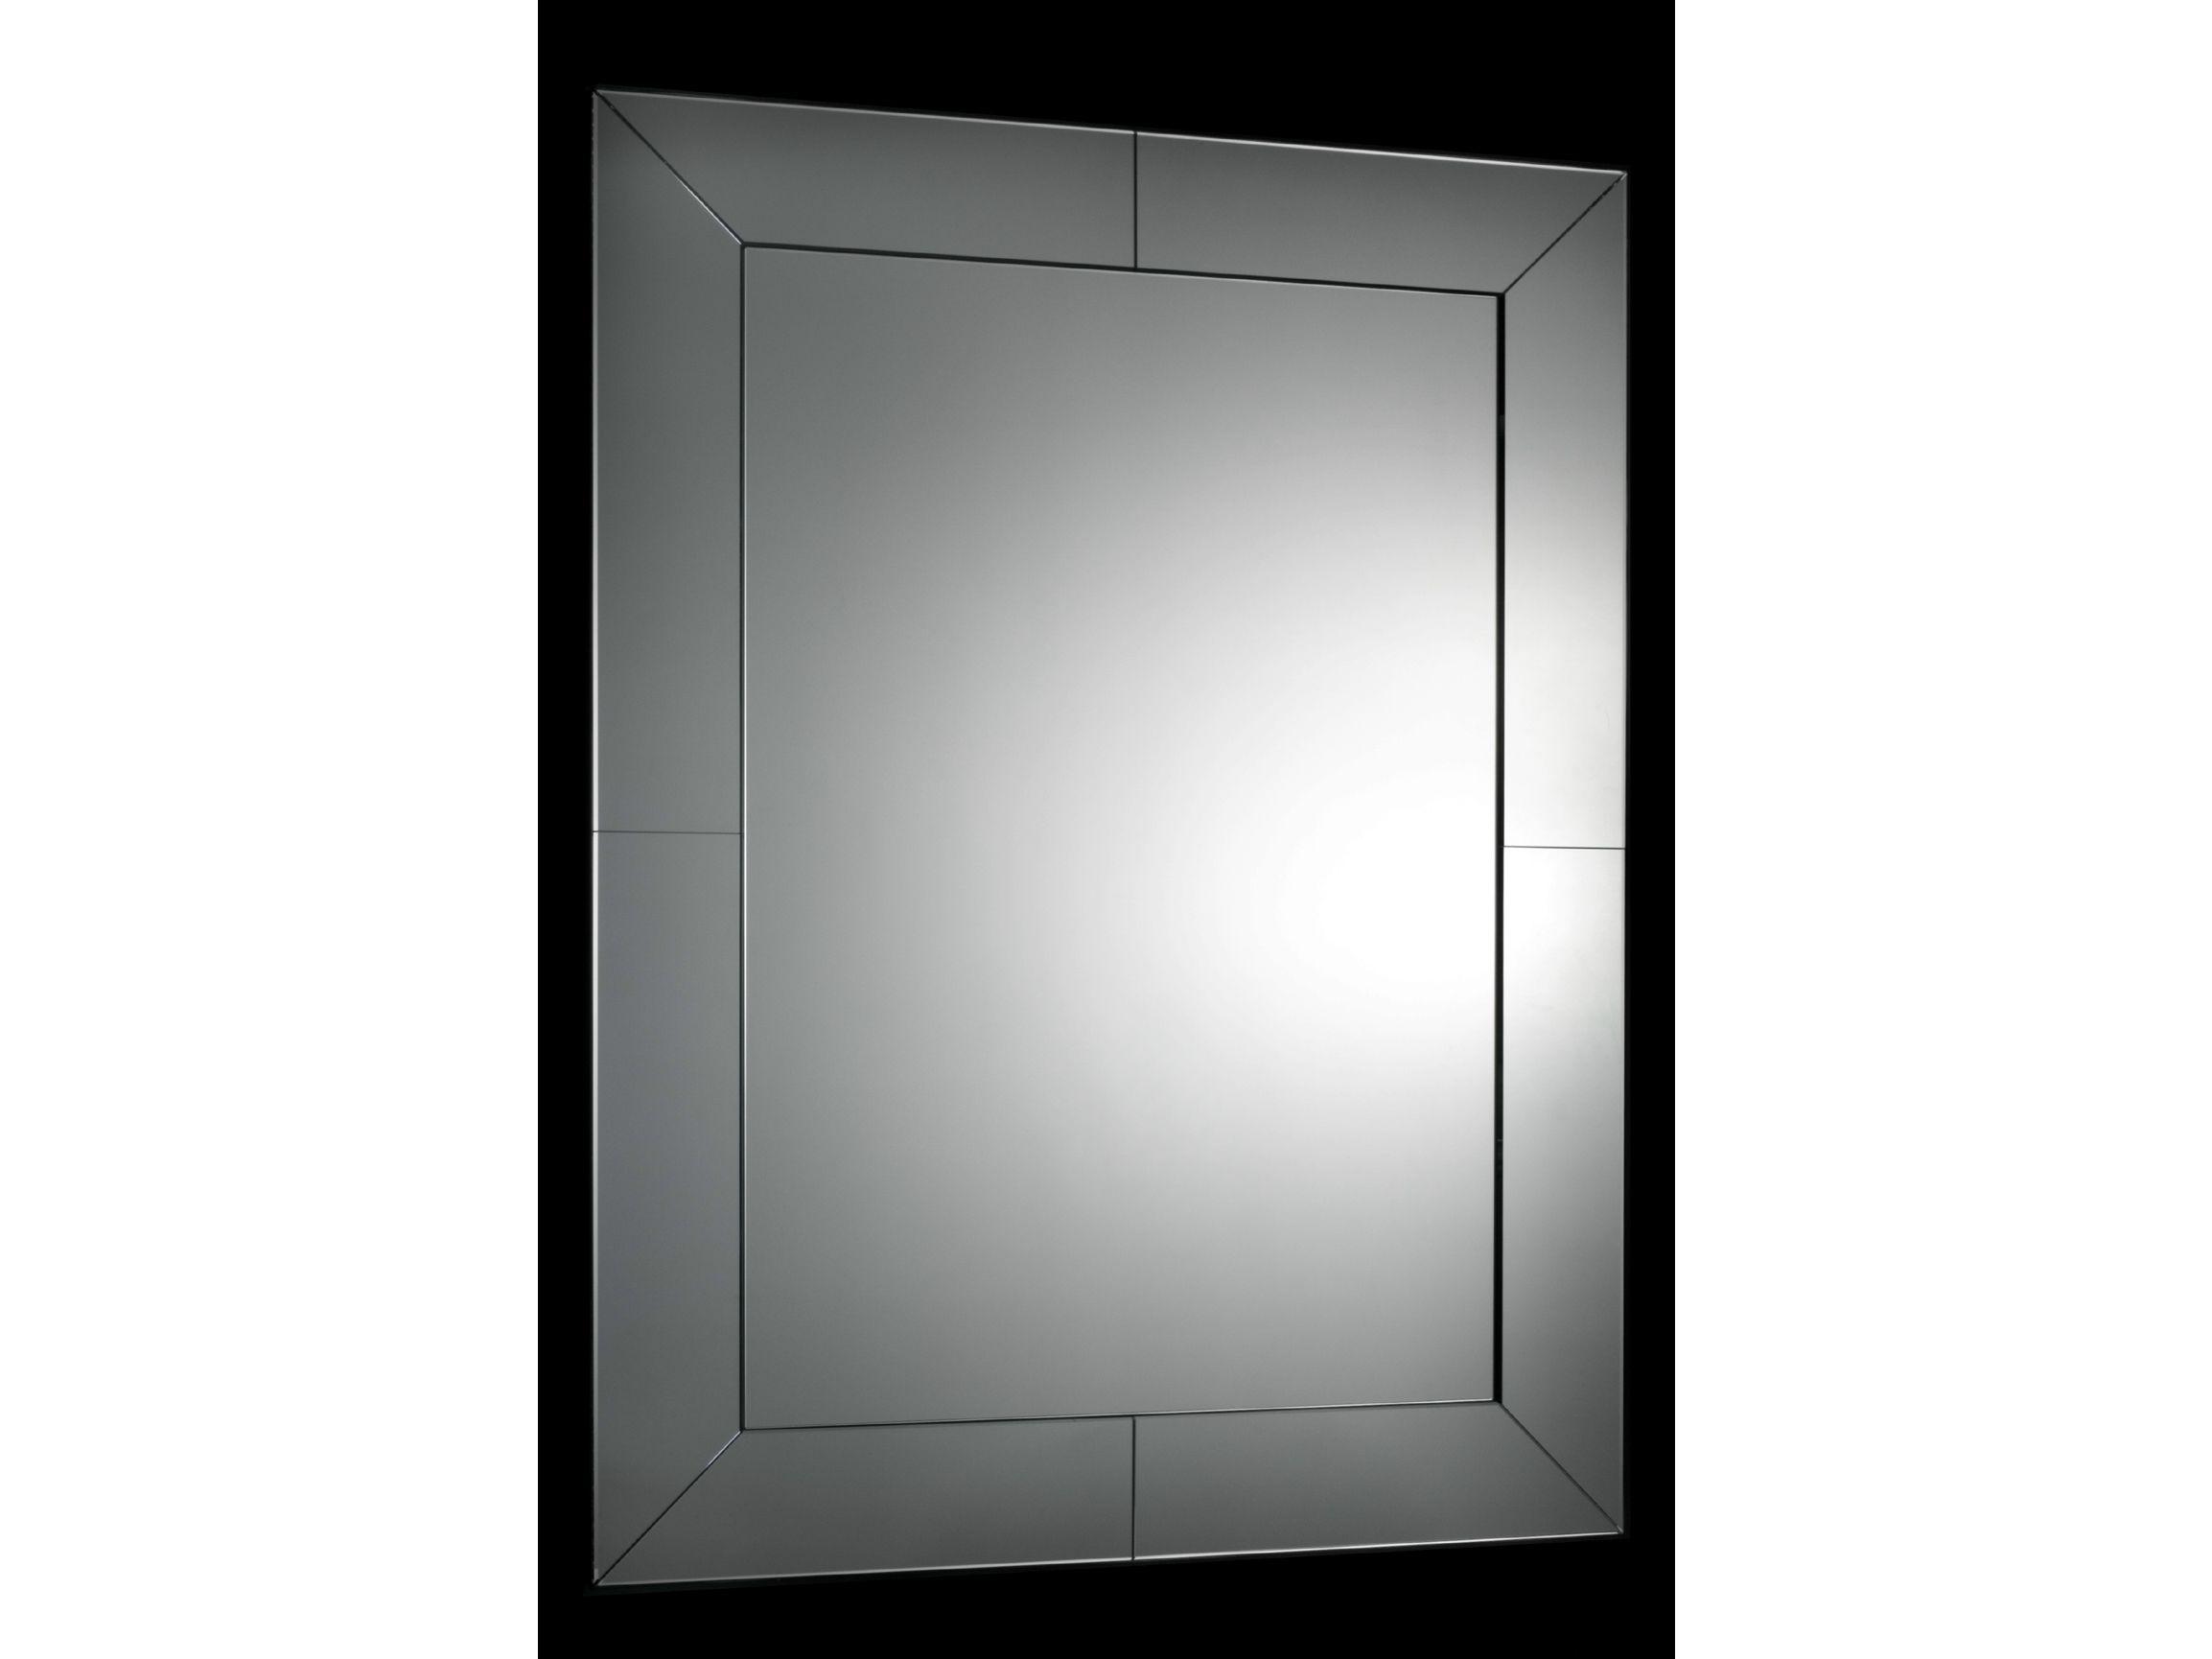 Miroir mural avec cadre pour salle de bain veneziana by for Miroir salle de bain cadre noir